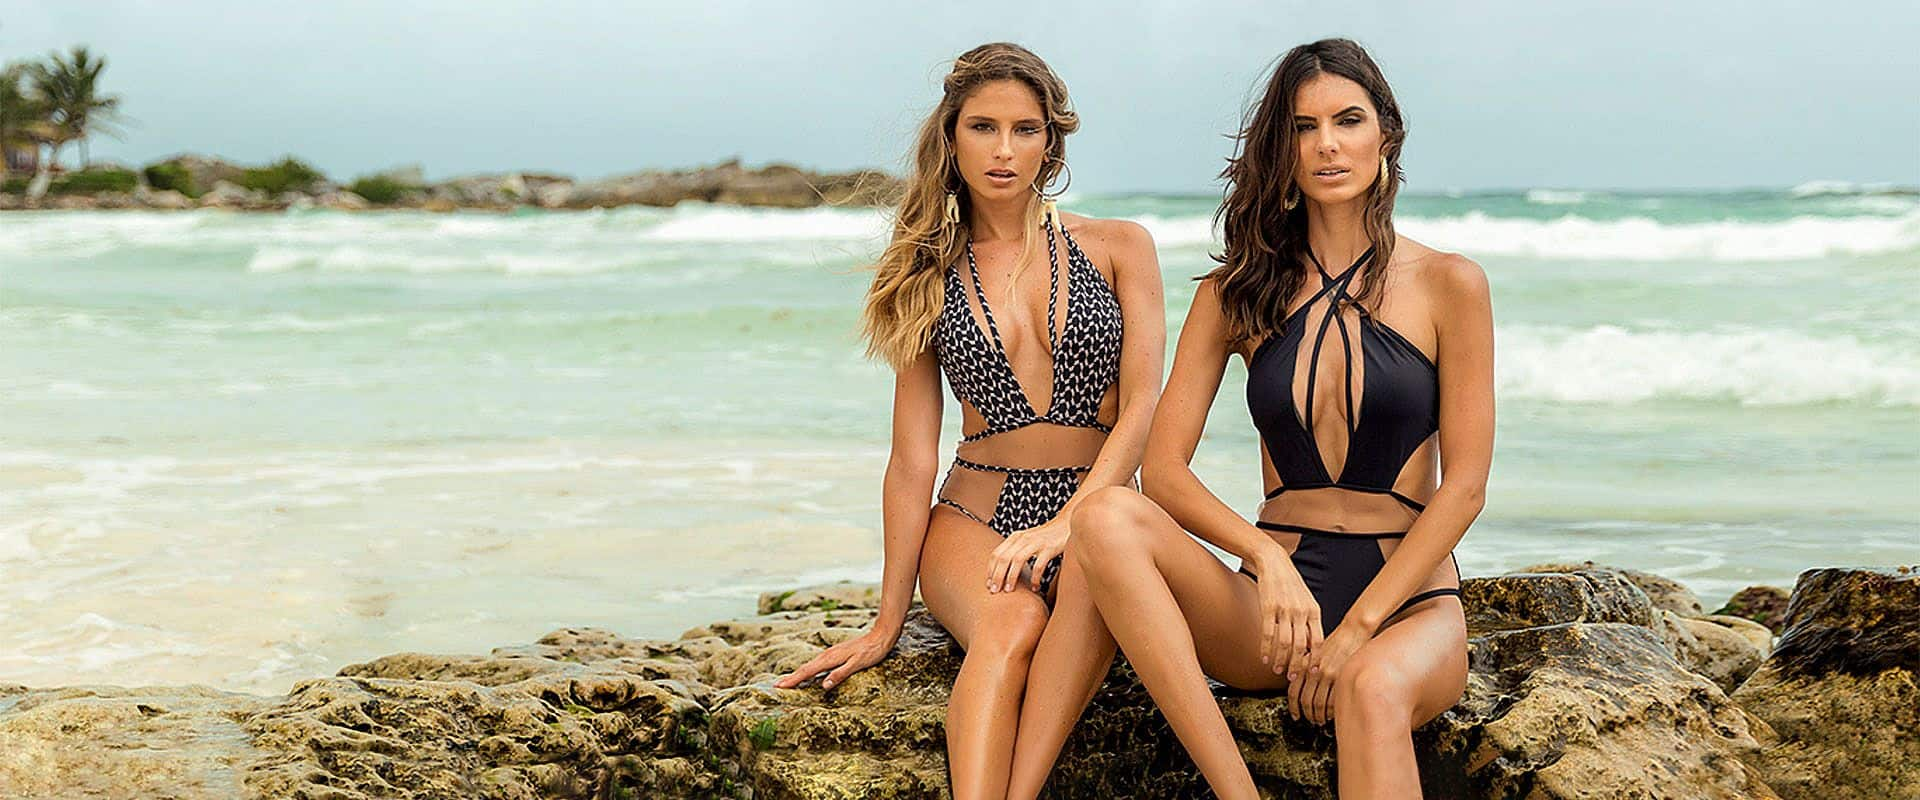 Larissa-Minatto-Verano-Beach-Safari-TM2-Bikini-Negro